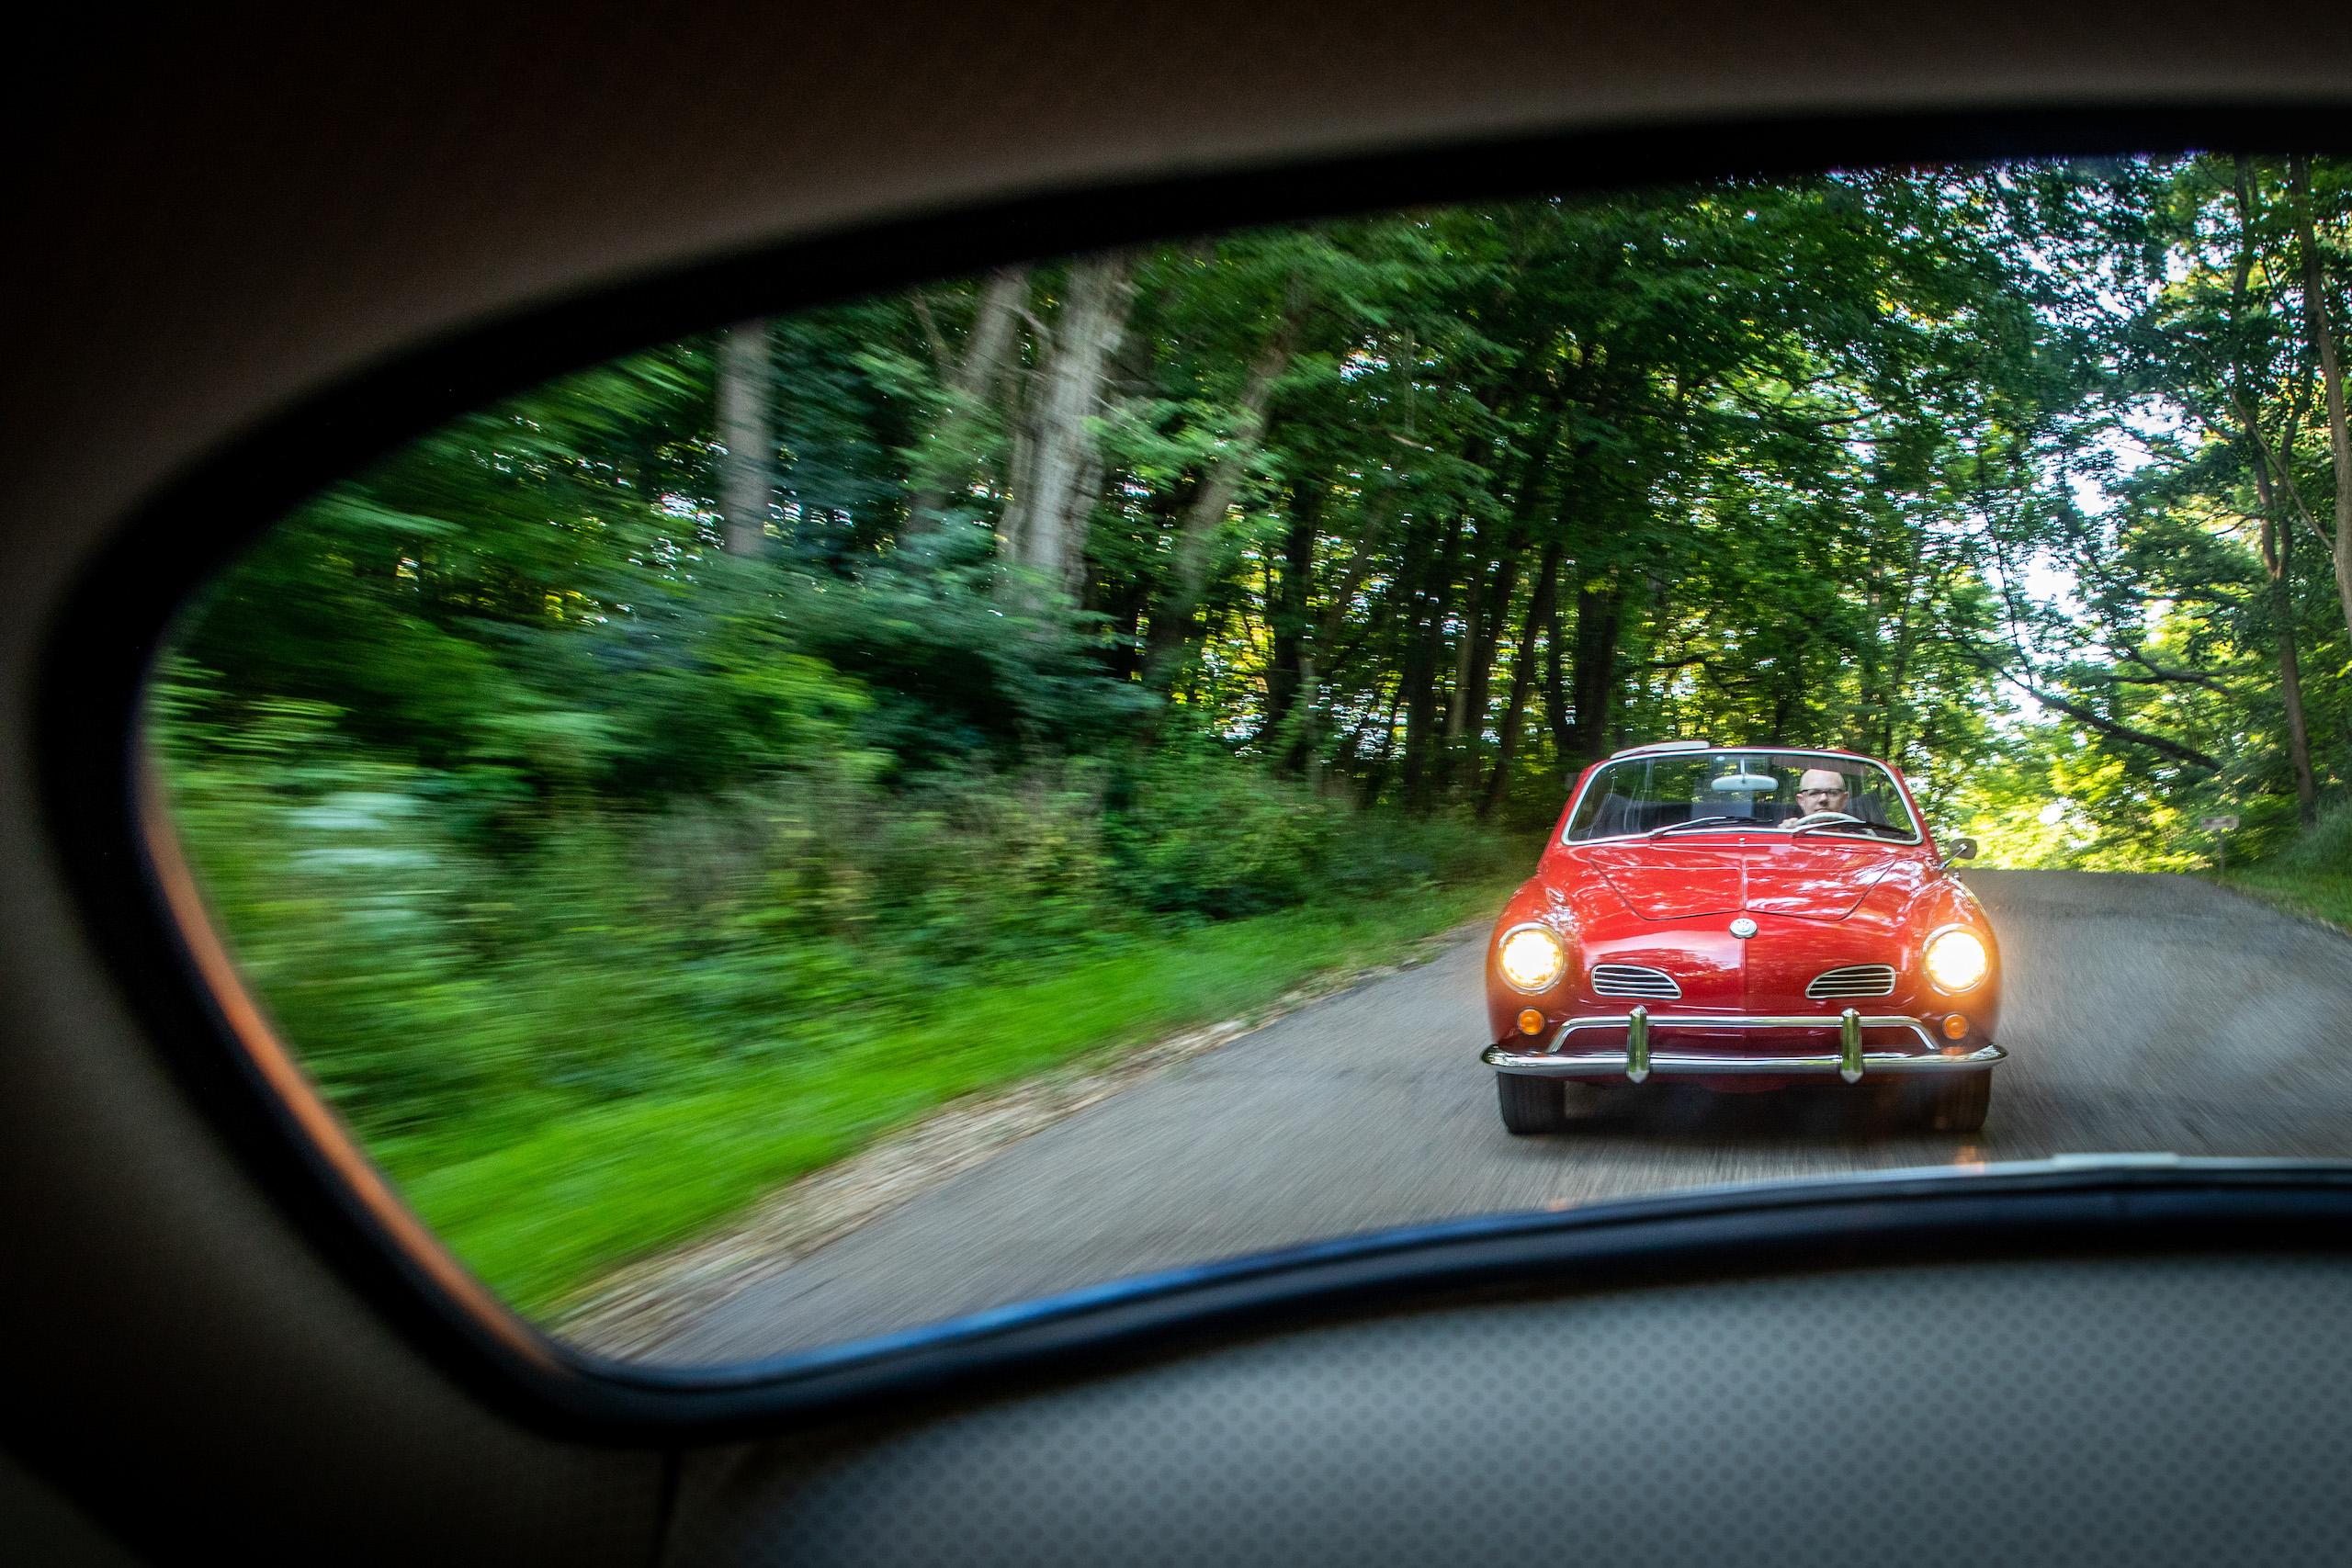 volkswagen karmann ghia front driving action